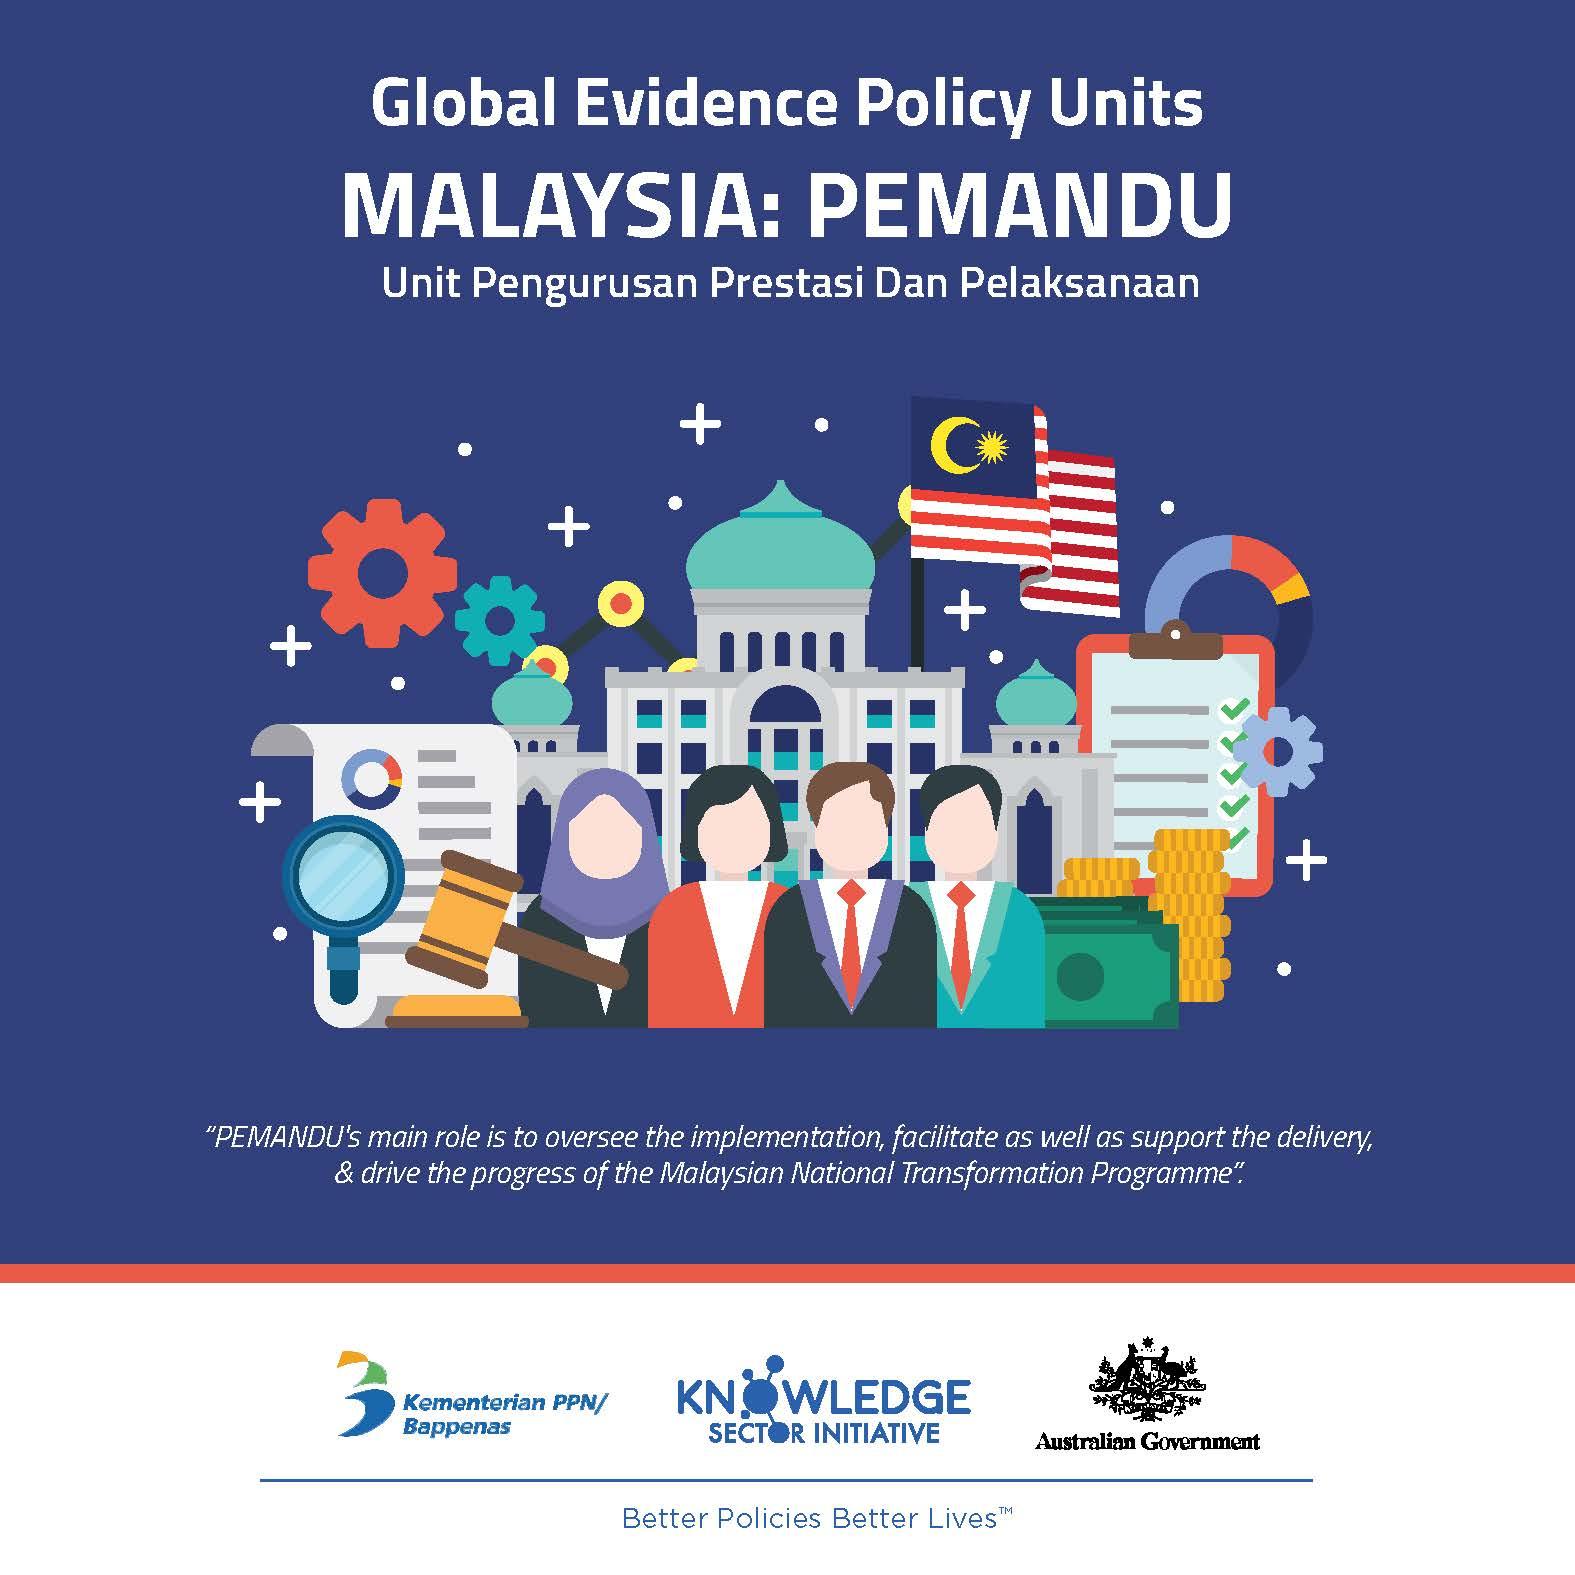 Evidence Policy Unit In Malaysia: PEMANDU